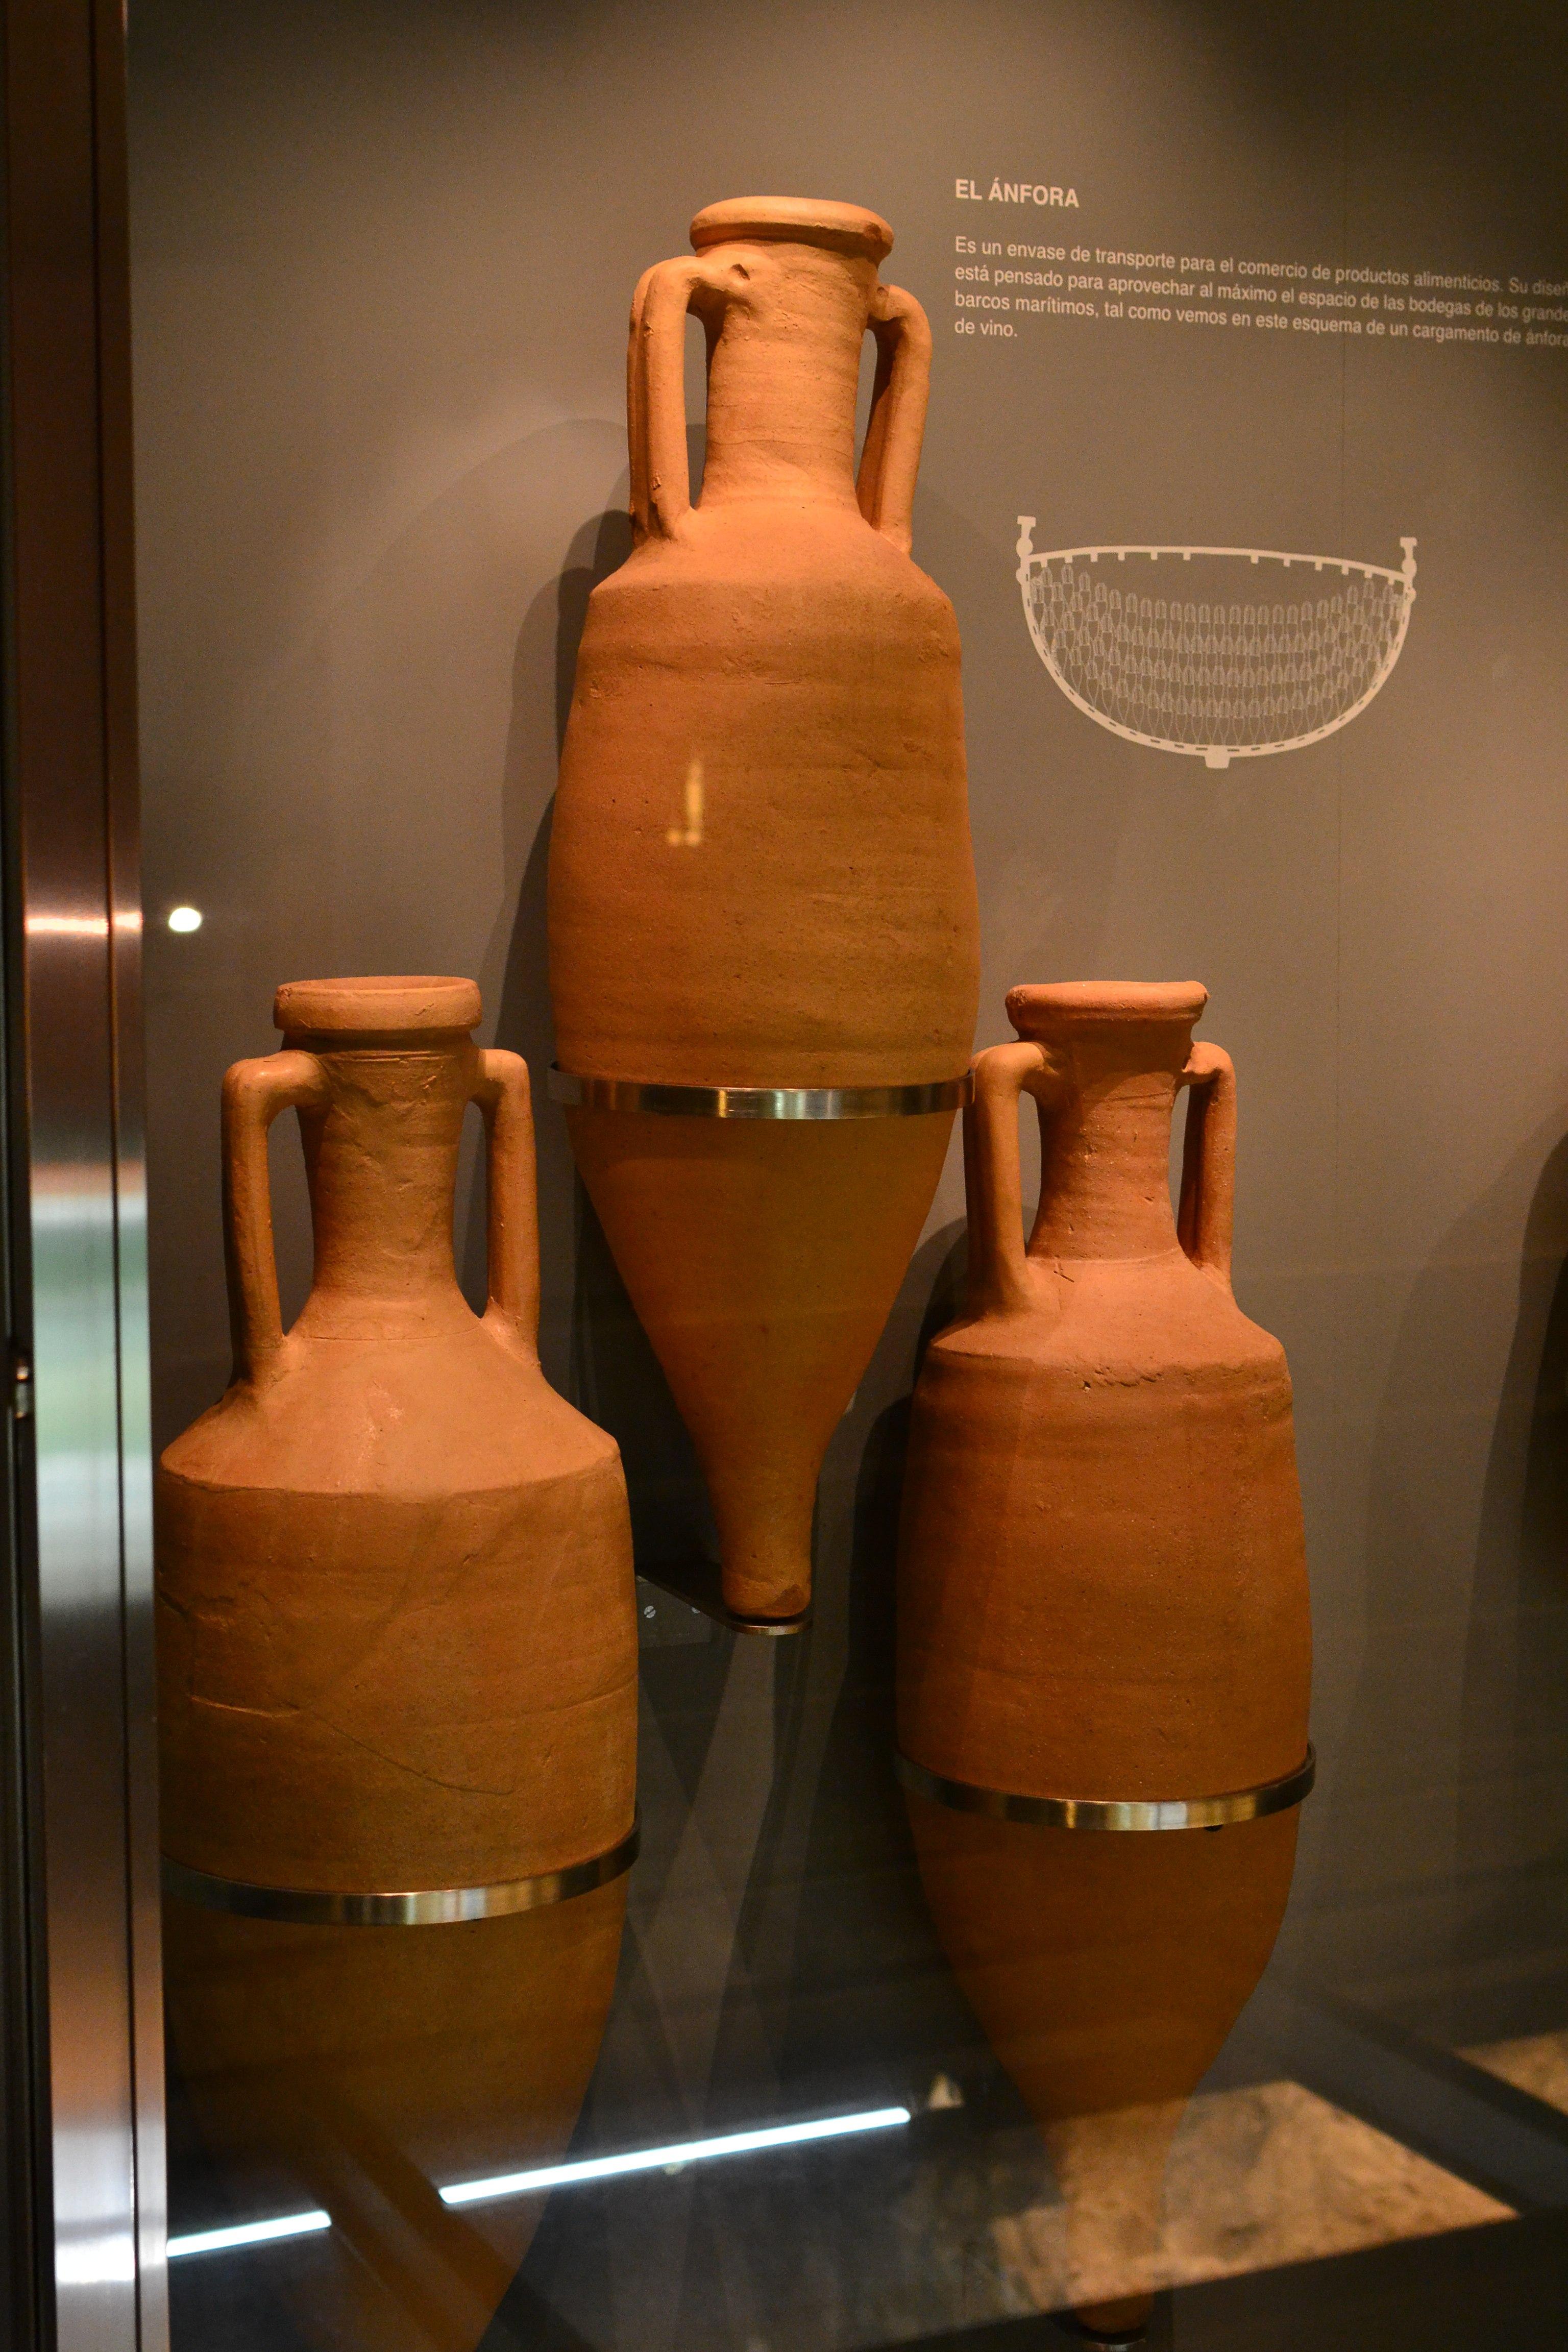 Ánfora romana de barro para fermentar y almacenar vino o hidromiel.